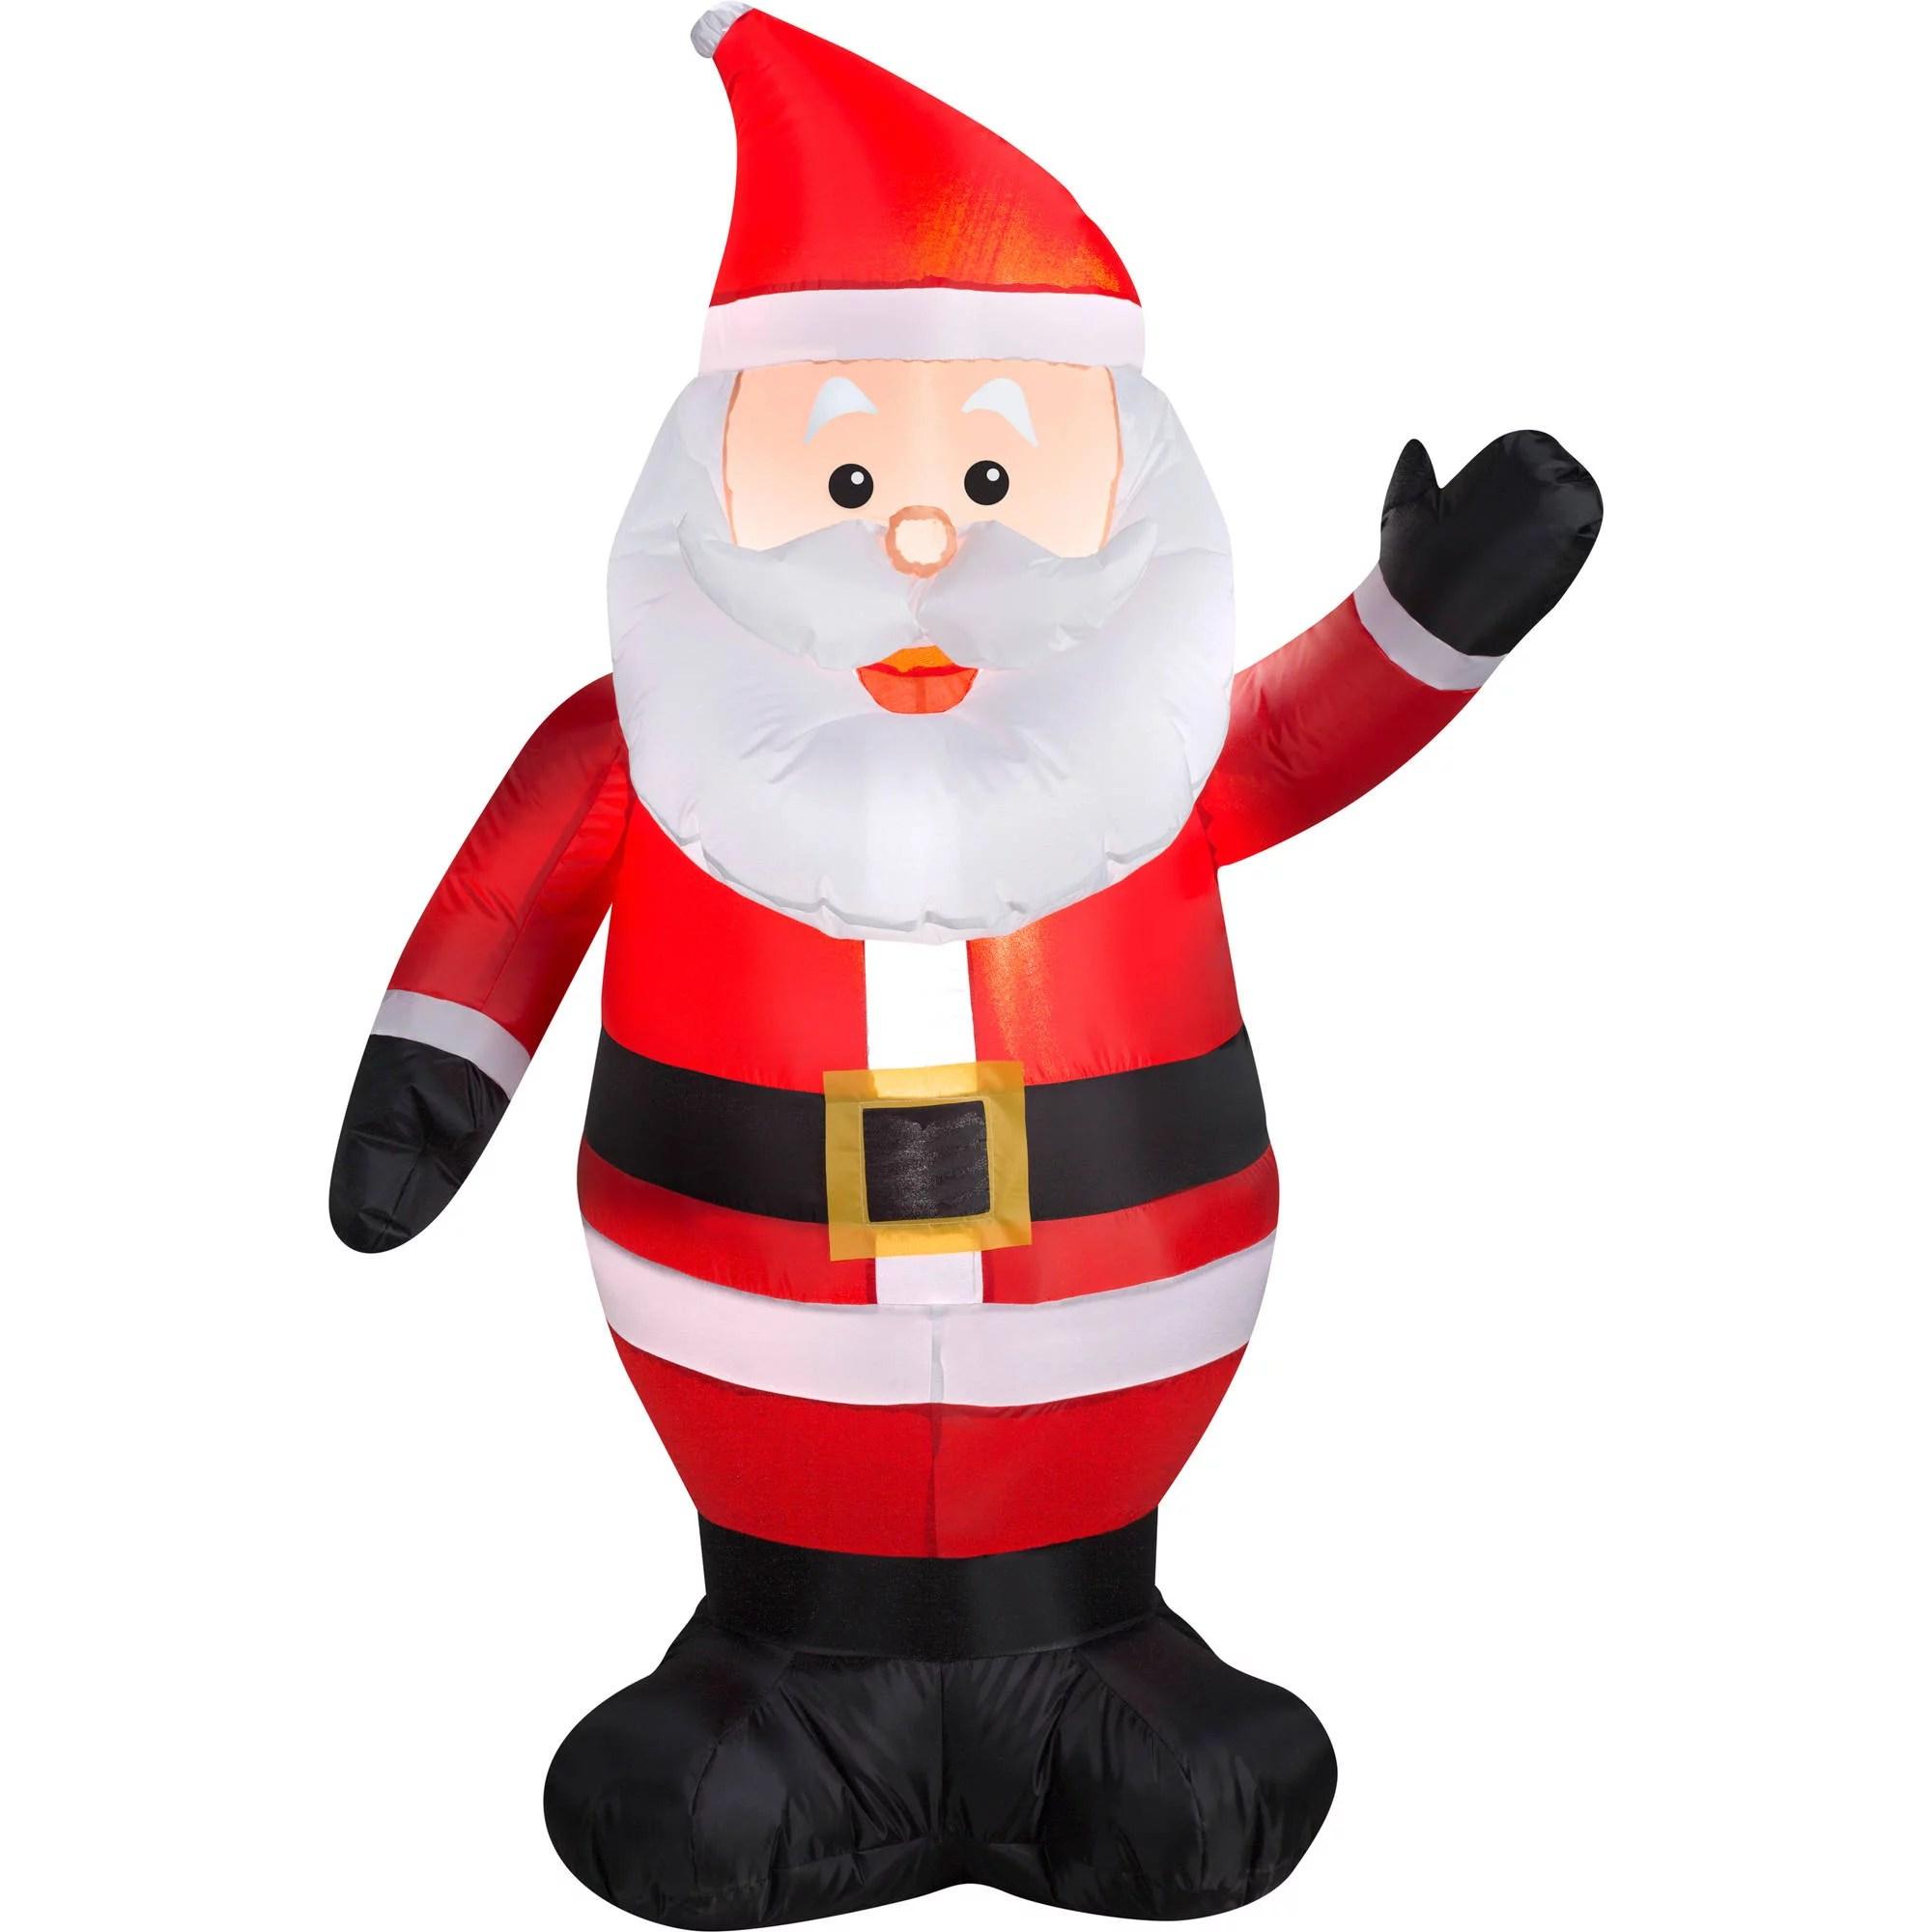 Gemmy Airblown Christmas Inflatables Waving Santa 4